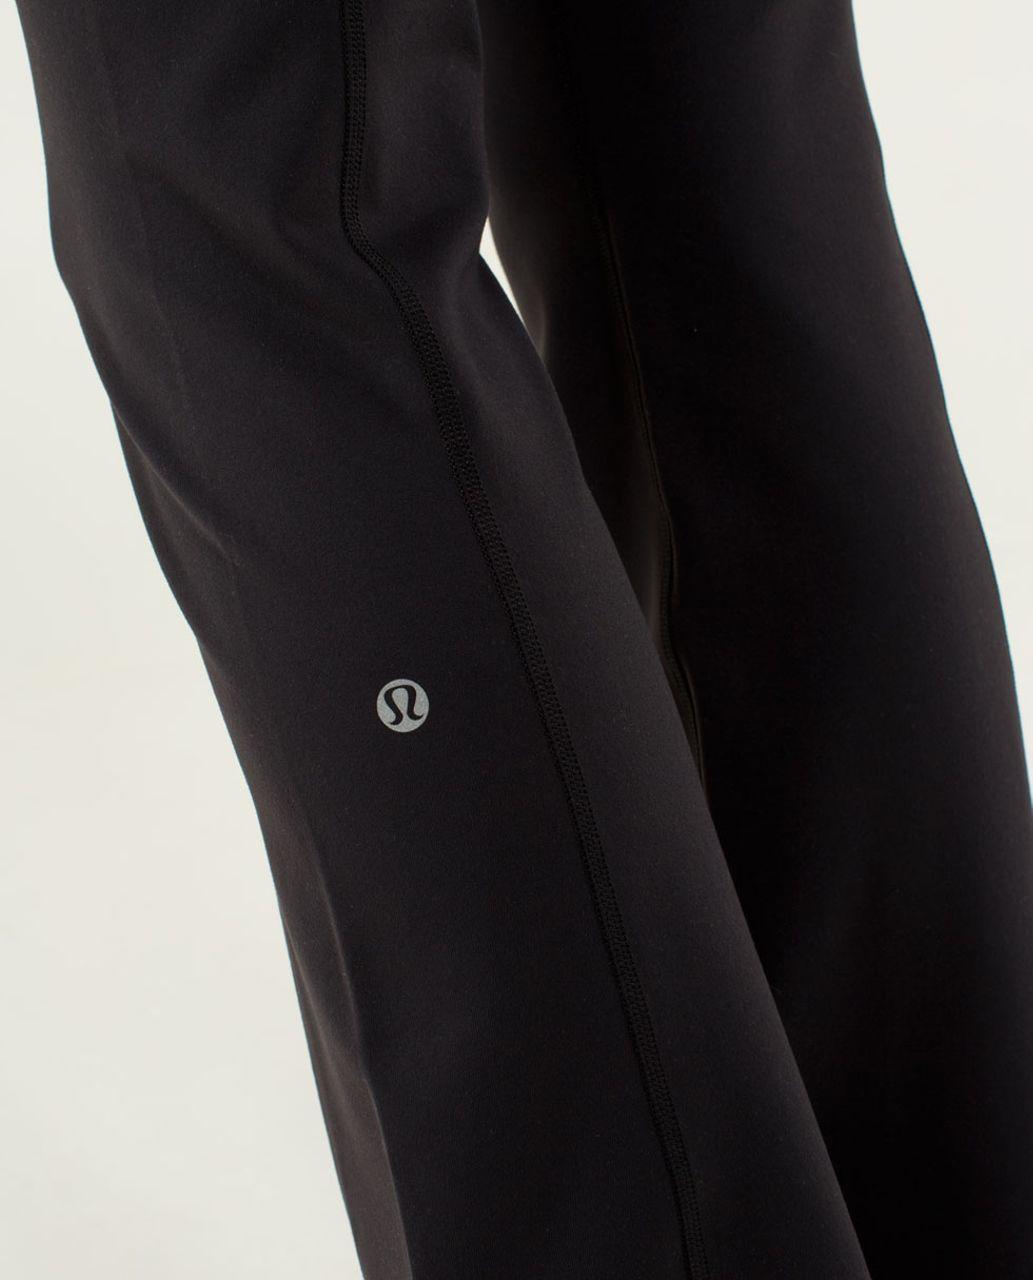 Lululemon Groove Pant (Tall) *Full-On Luon - Black / Quilt Spring 14-07